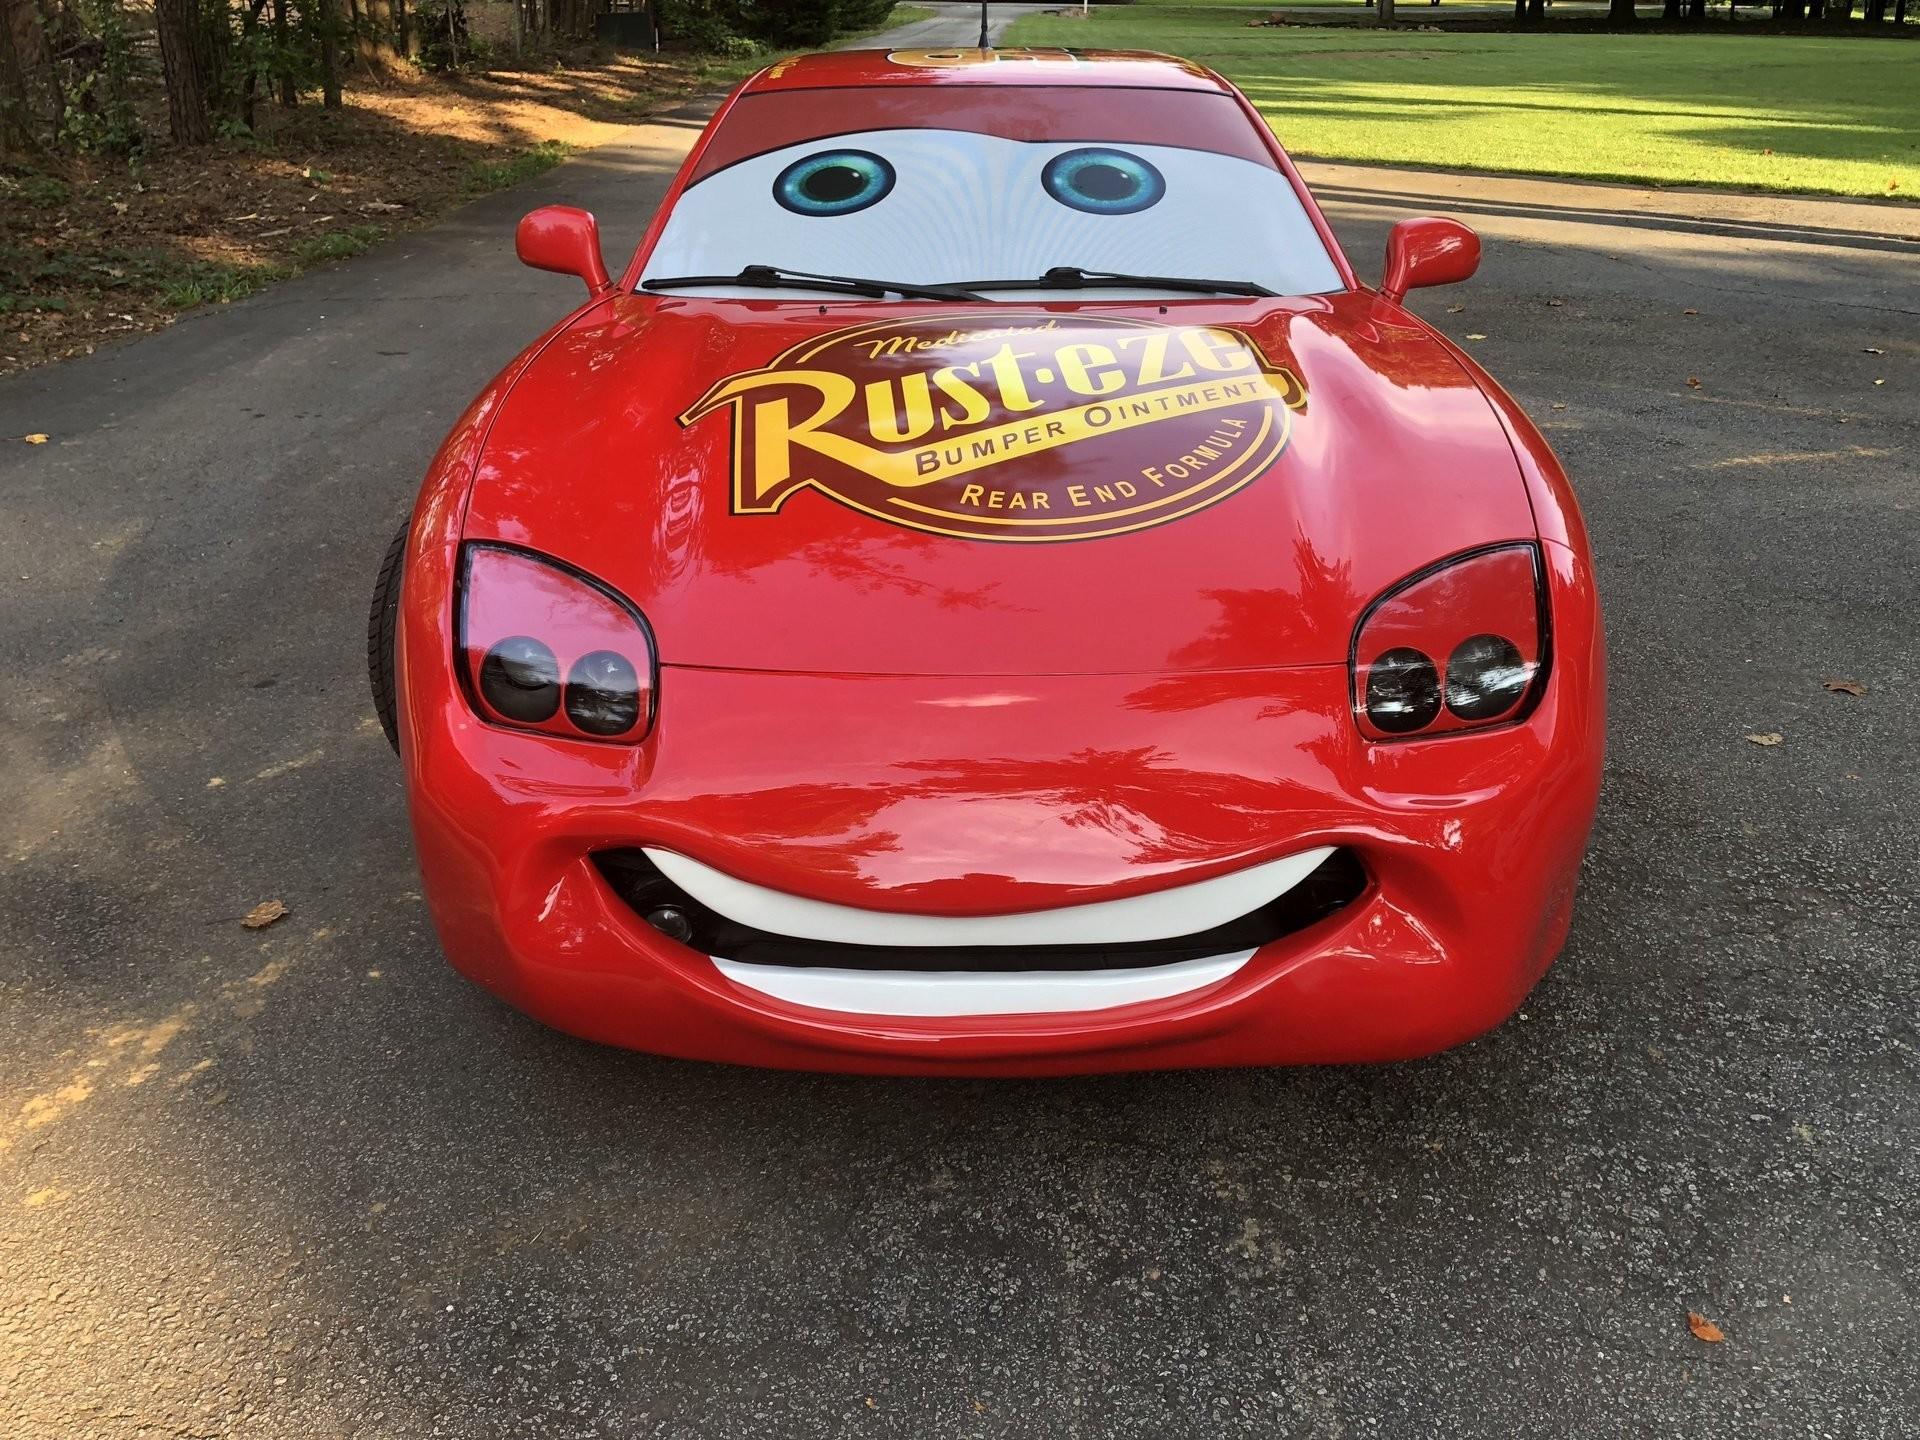 Res: 1920x1440, 1994 Z Movie Car Lightning Mcqueen Ideal Classic Cars Llc